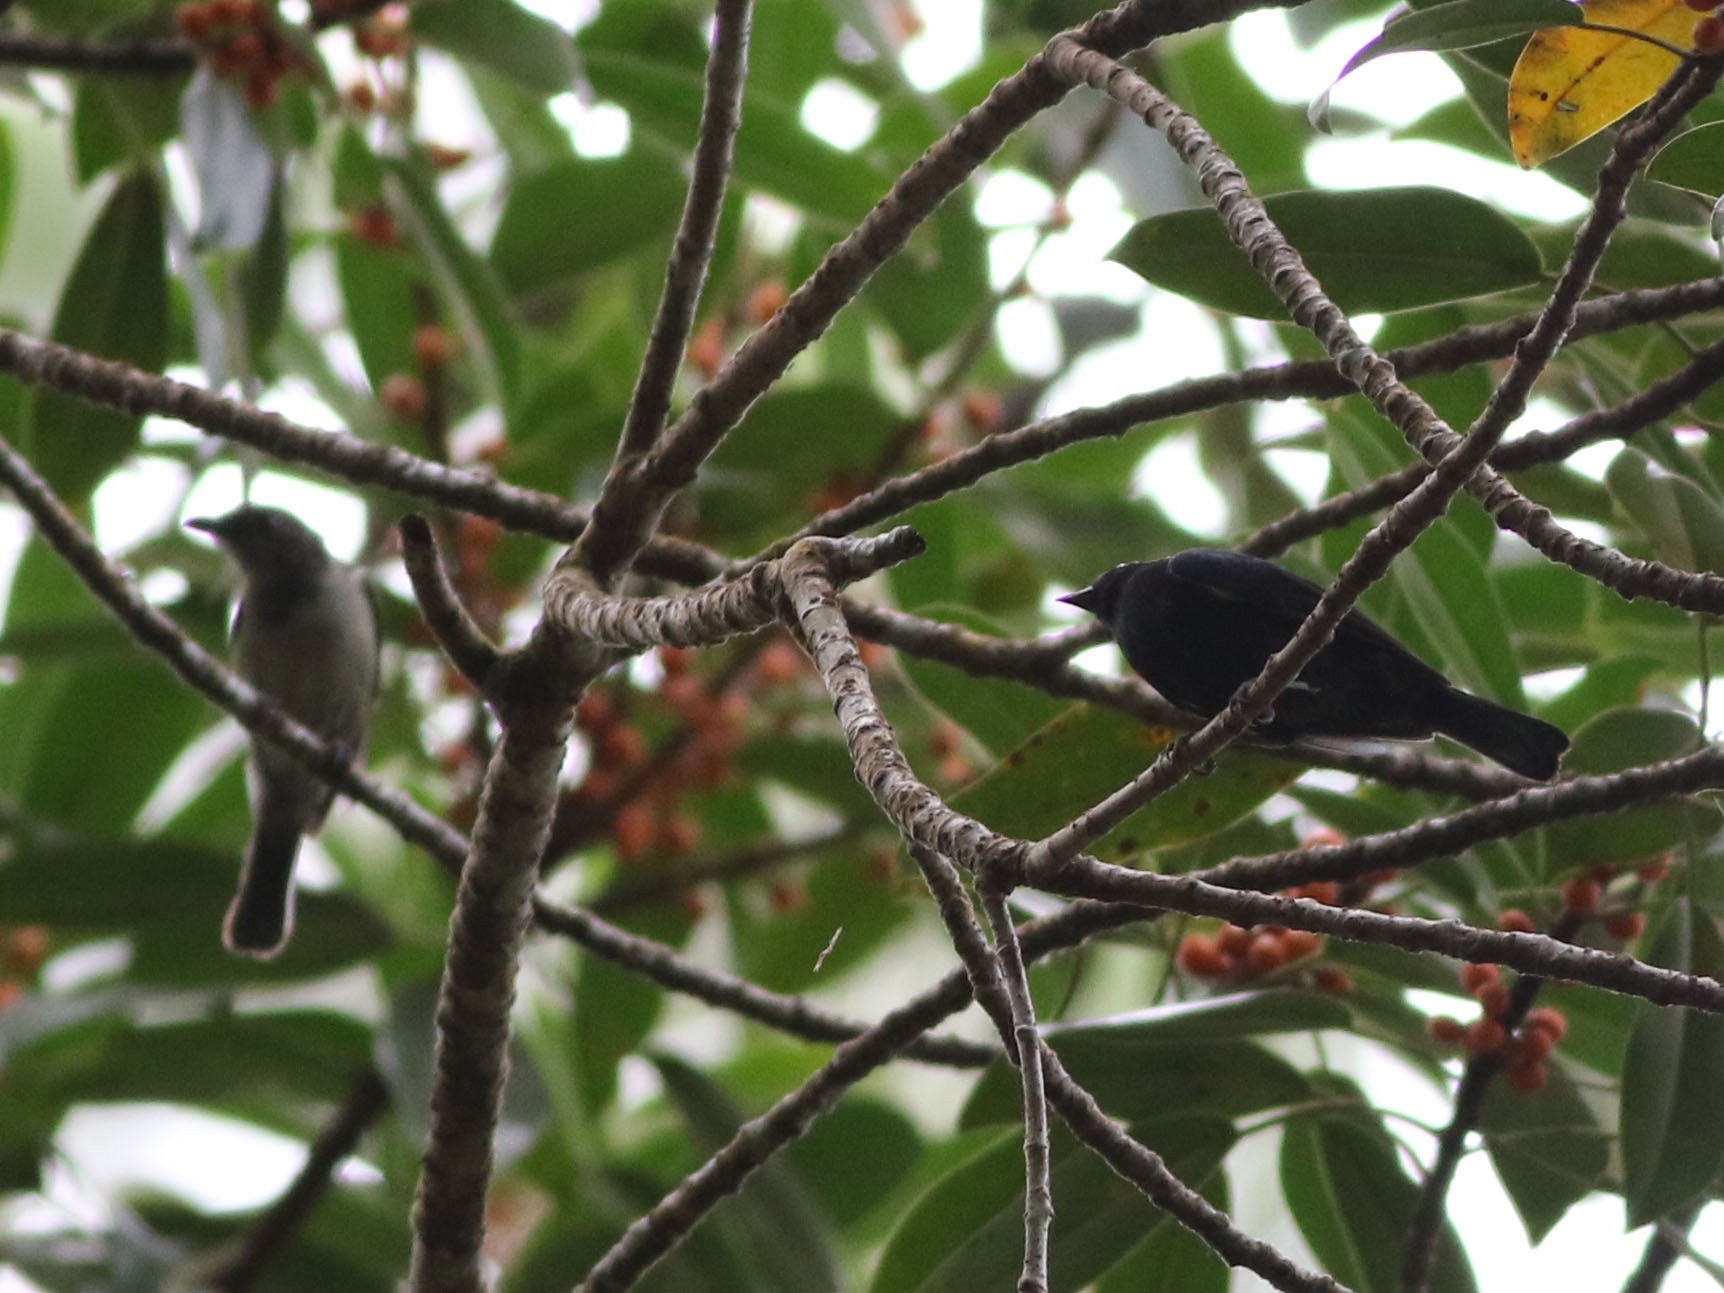 Black Berrypecker - Chris Wiley